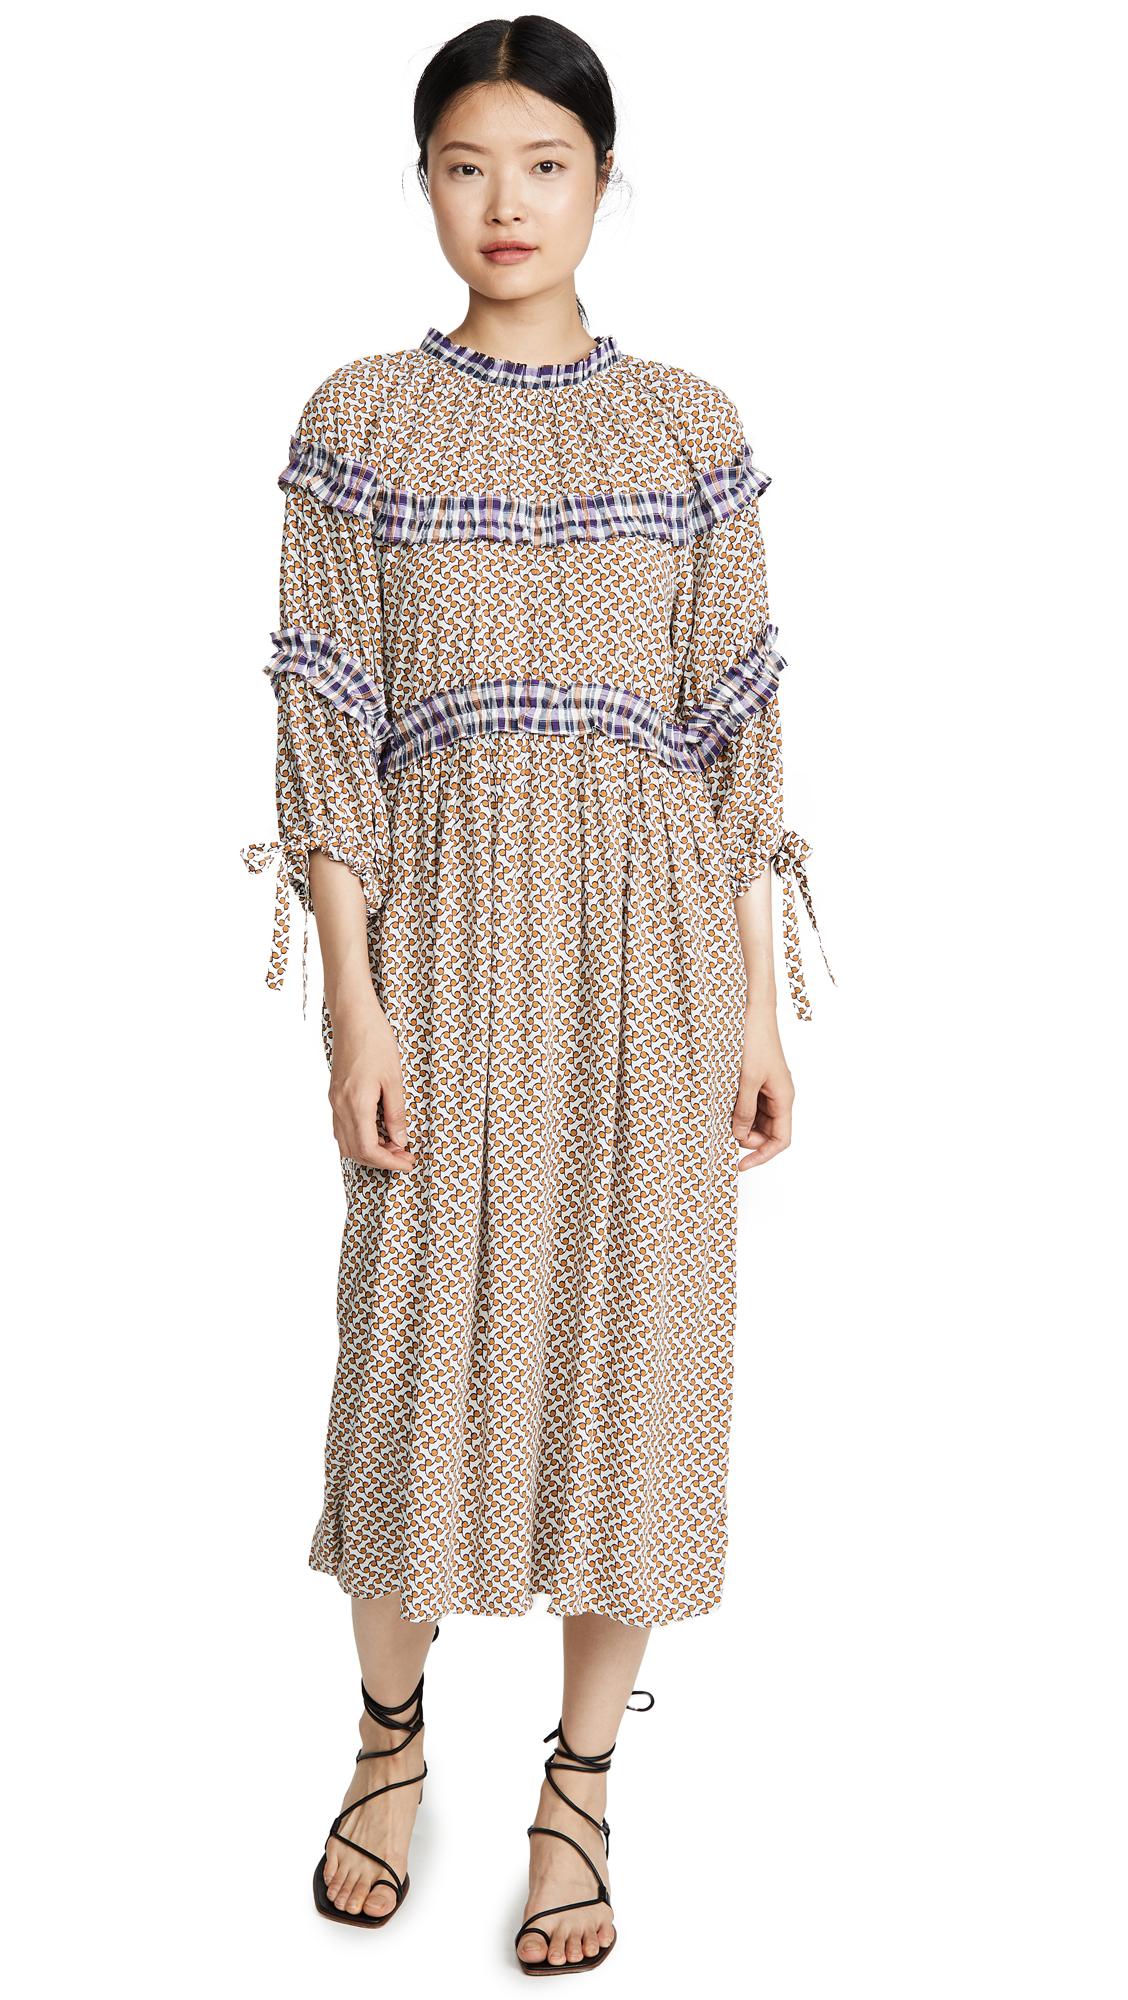 Hofmann Copenhagen Miriella Dress - 40% Off Sale